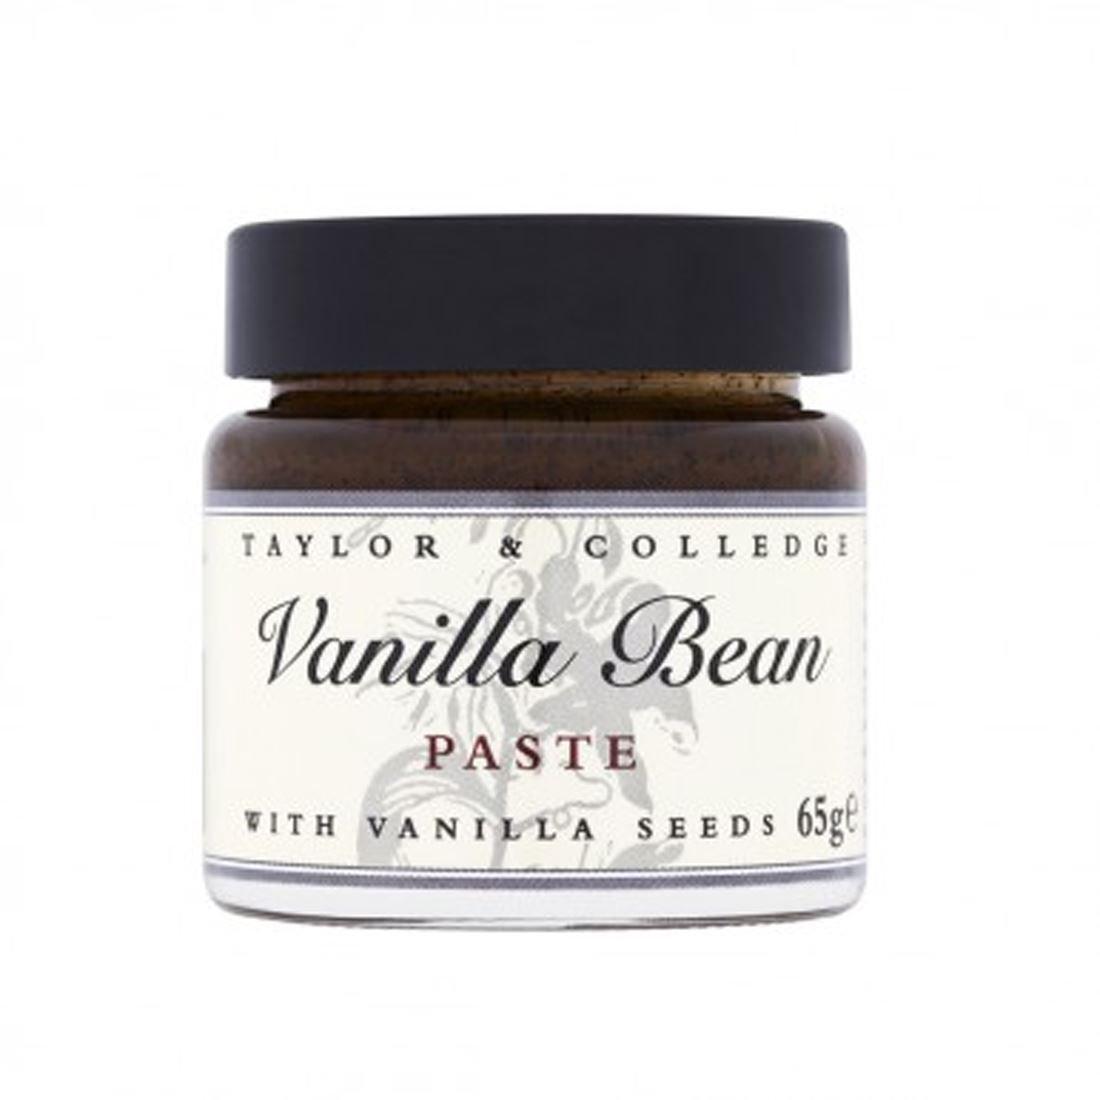 Taylor & Colledge   Vanilla Bean Paste   1 x 65g